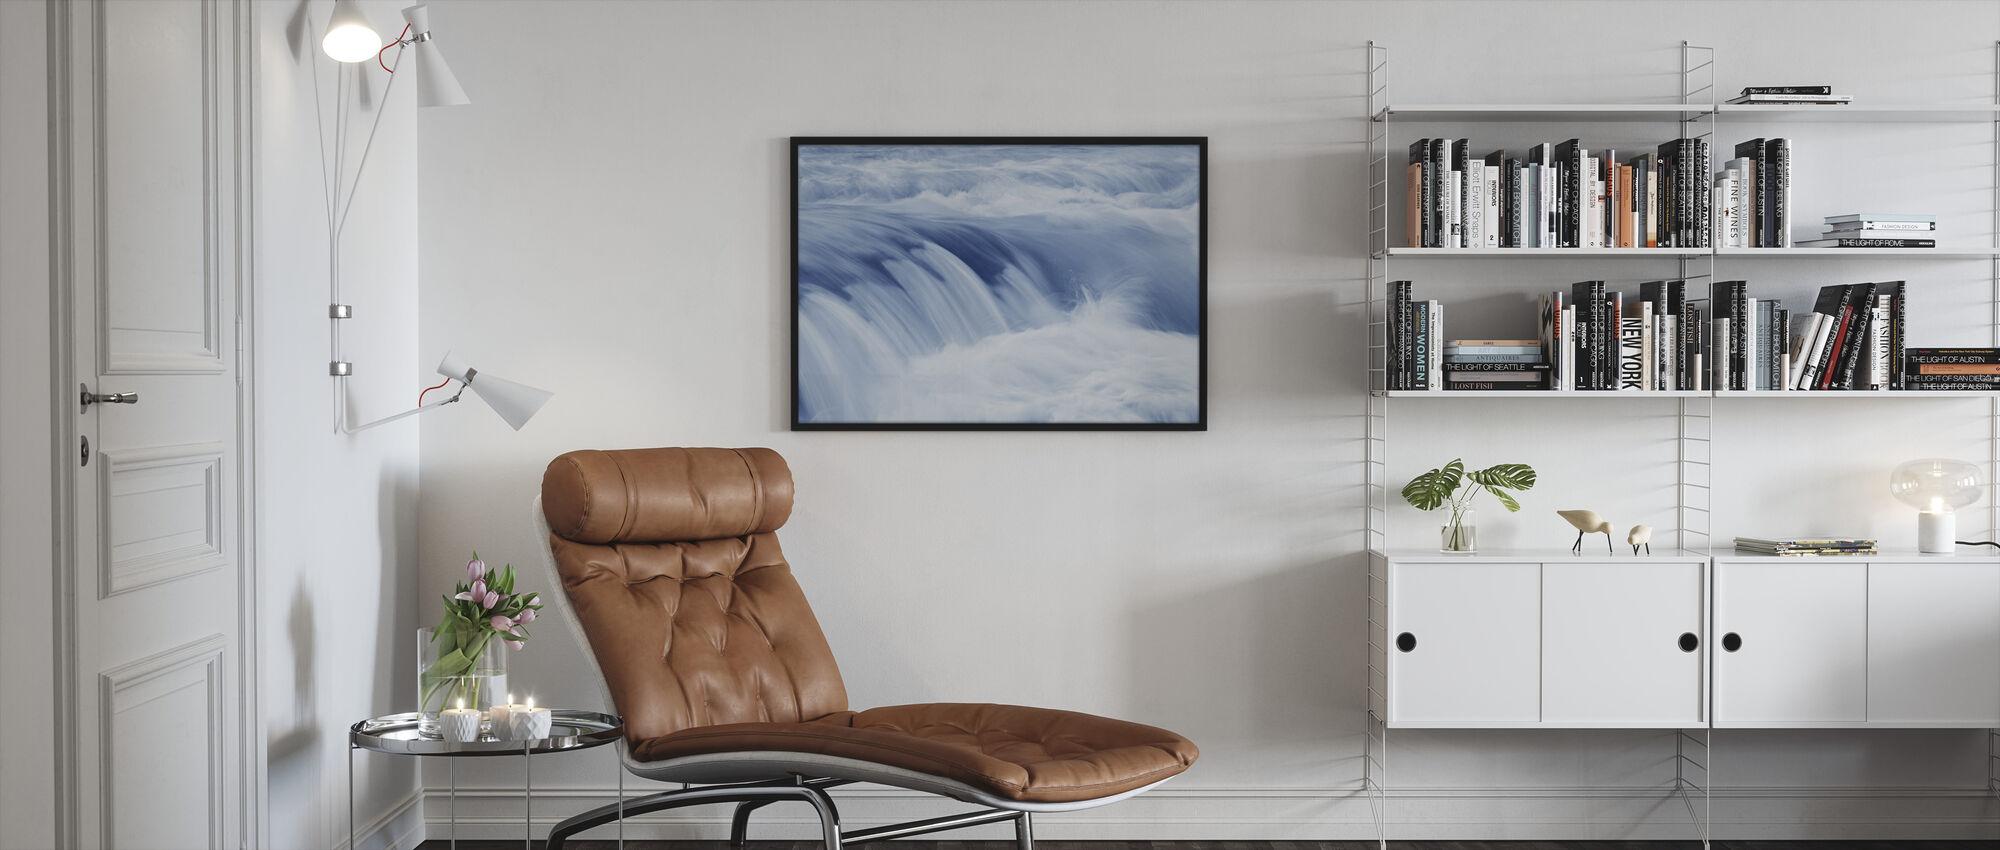 Swiftly Moving Stream - Framed print - Living Room